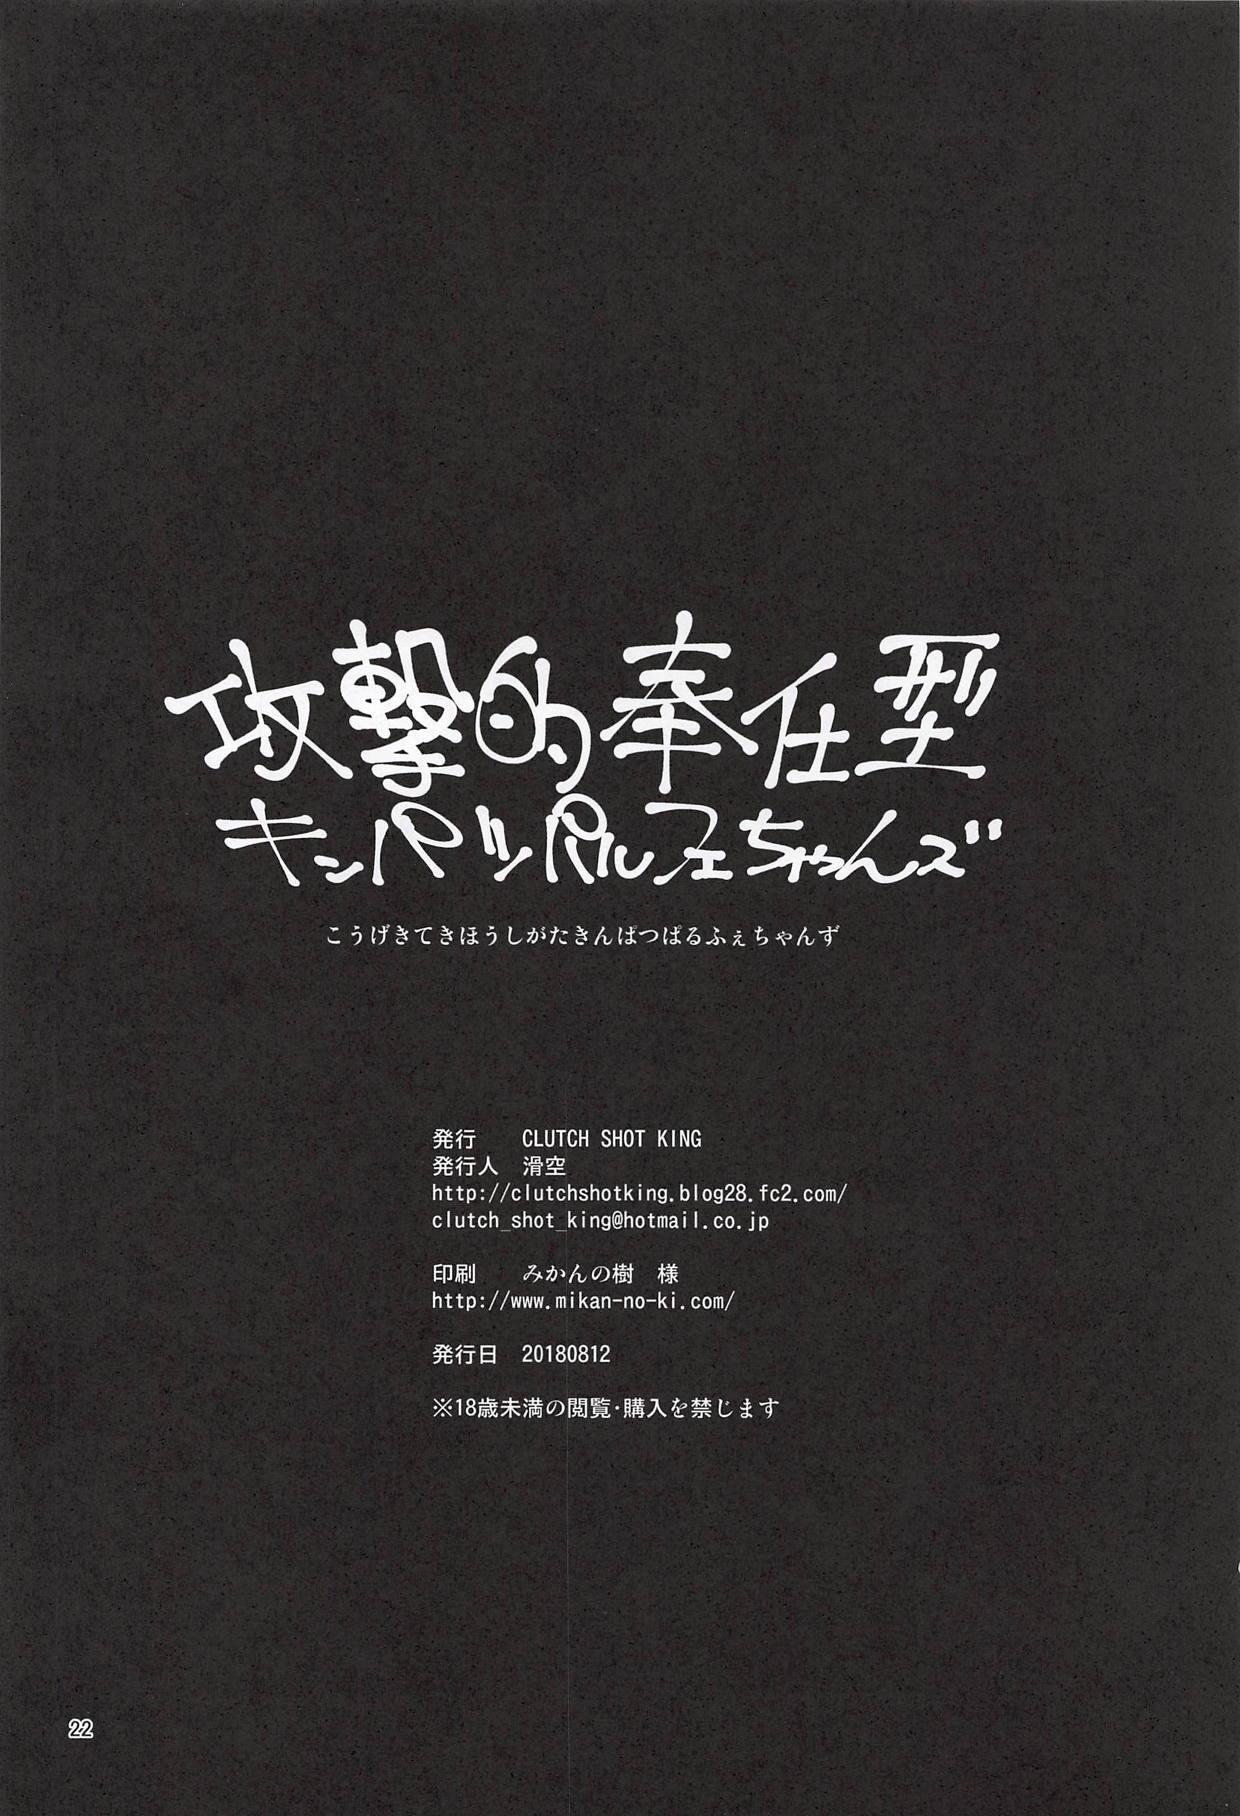 Kougekiteki Houshigata Kinpatsu Parfait-chans 20